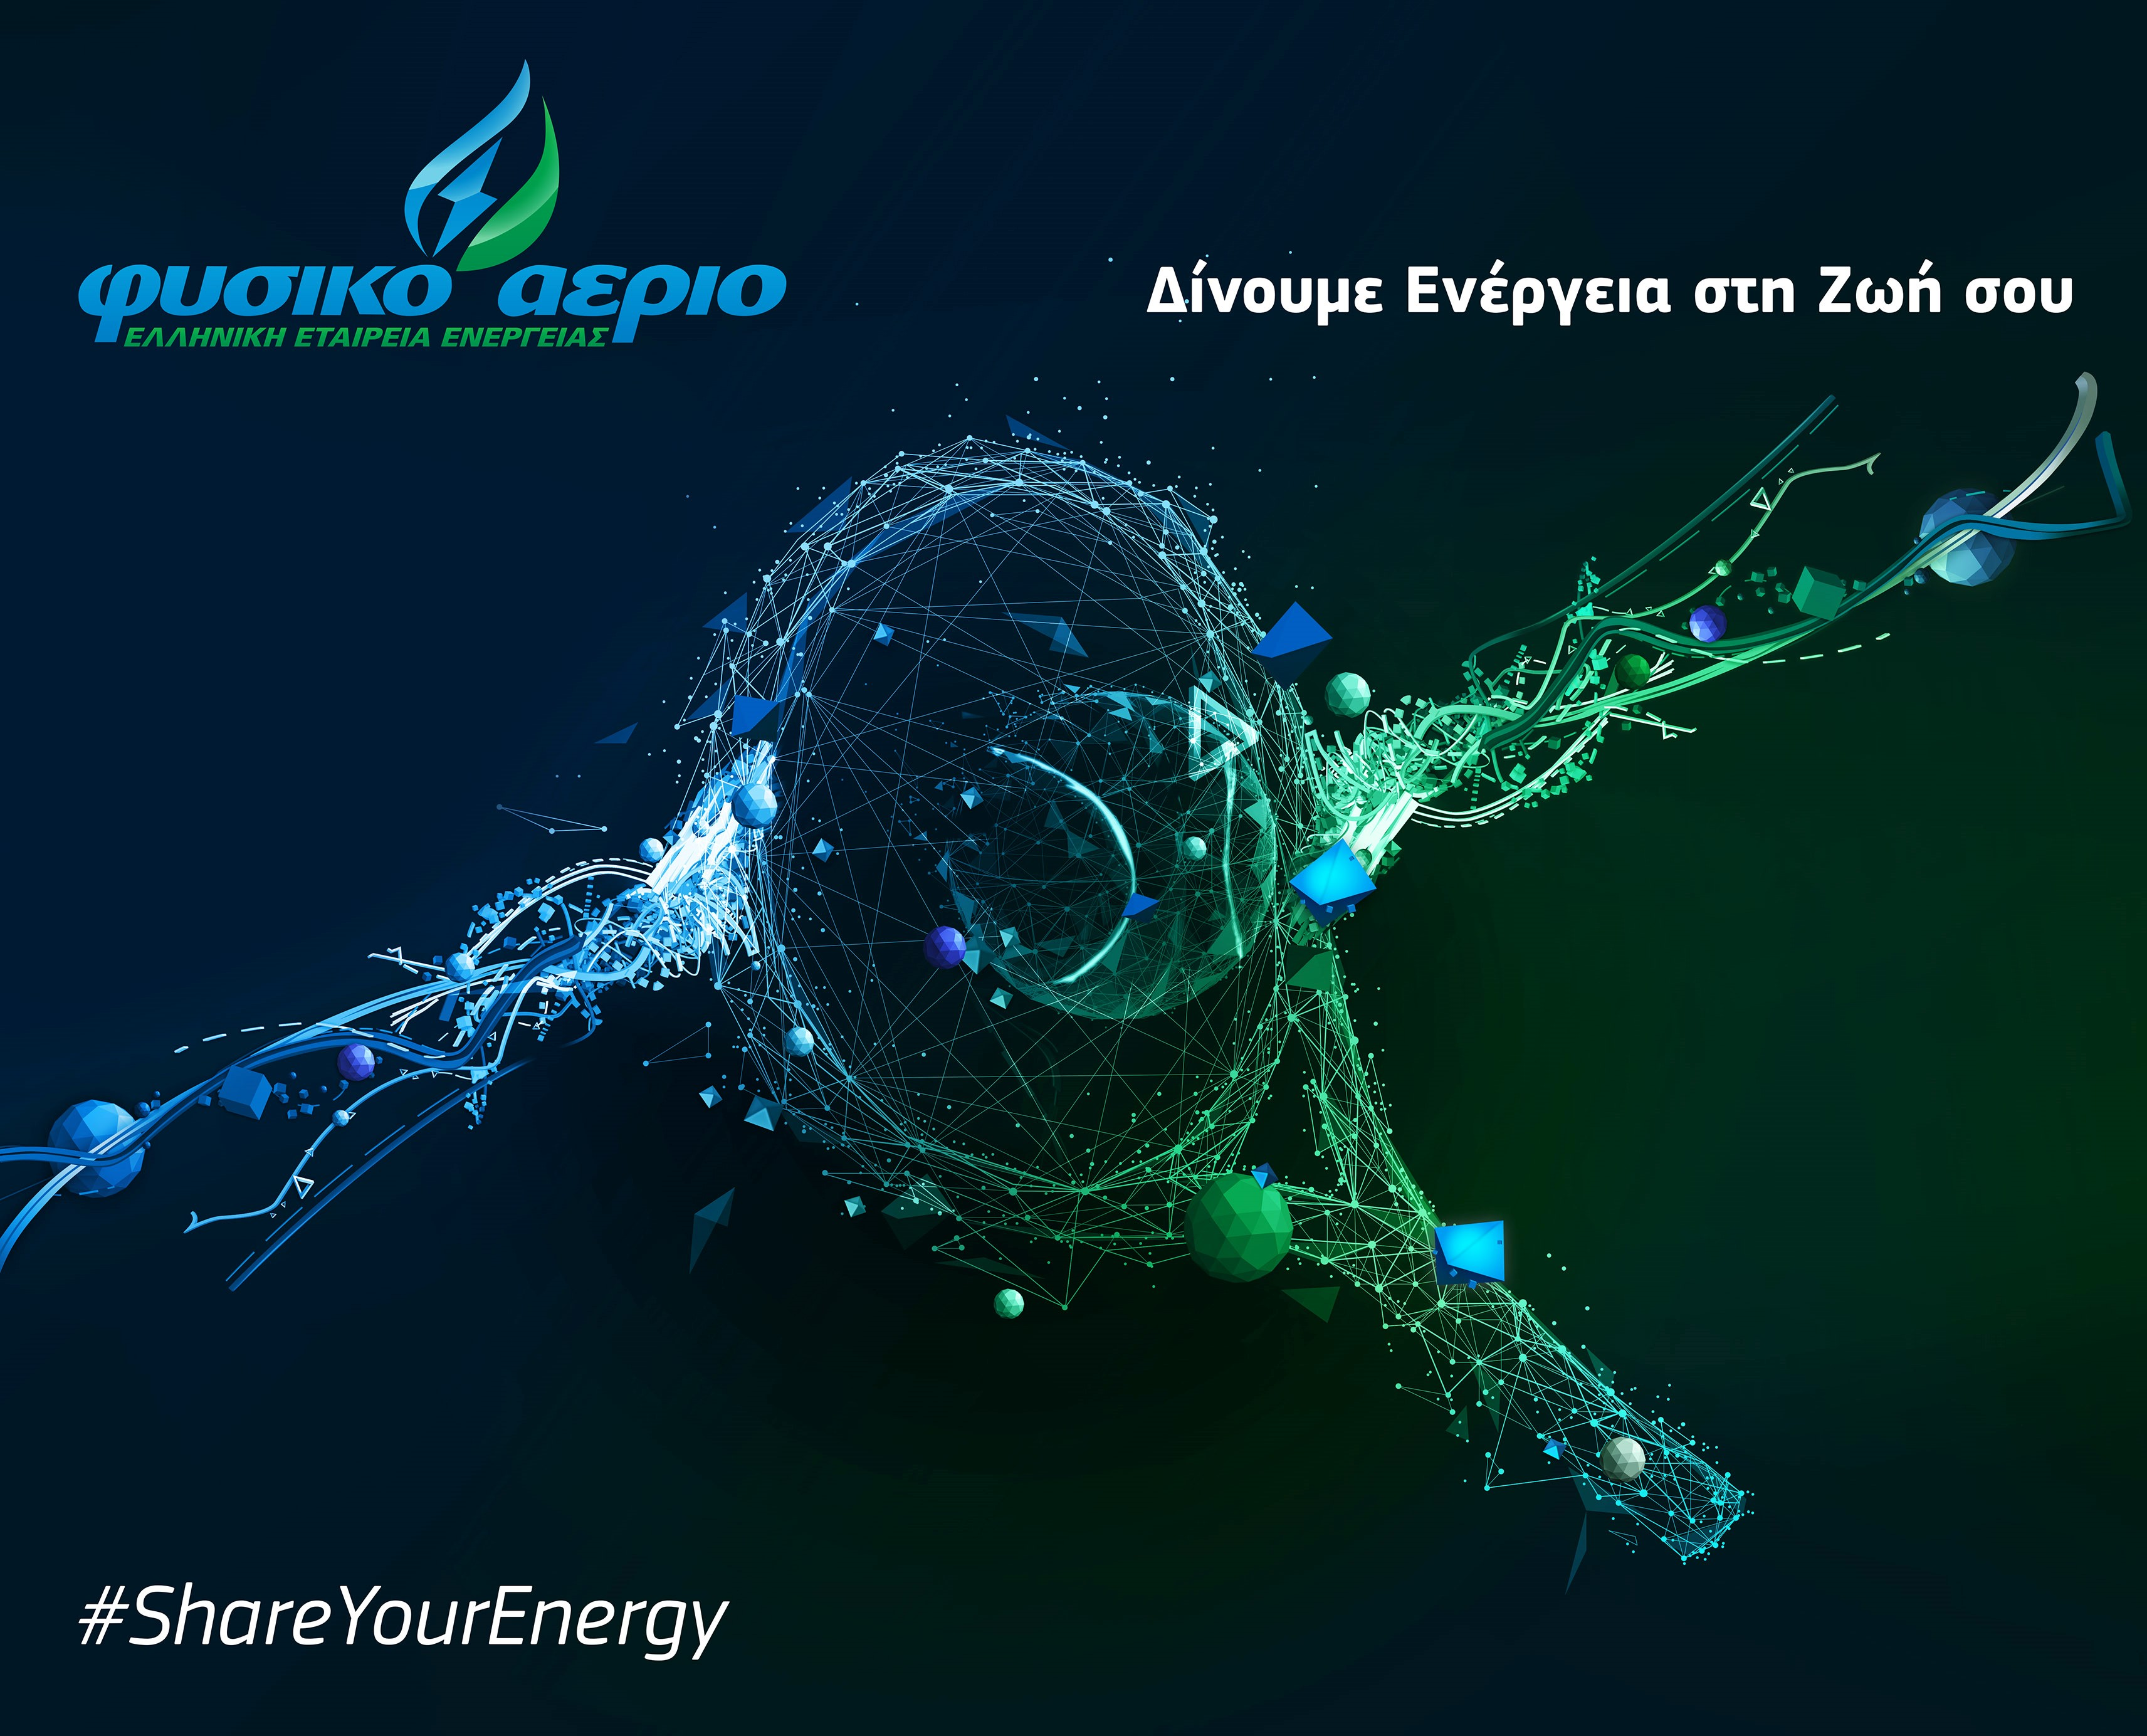 To Φυσικό Αέριο Ελληνική Εταιρεία Ενέργειας συμμετέχει για 2η χρονιά στη ΔΕΘ